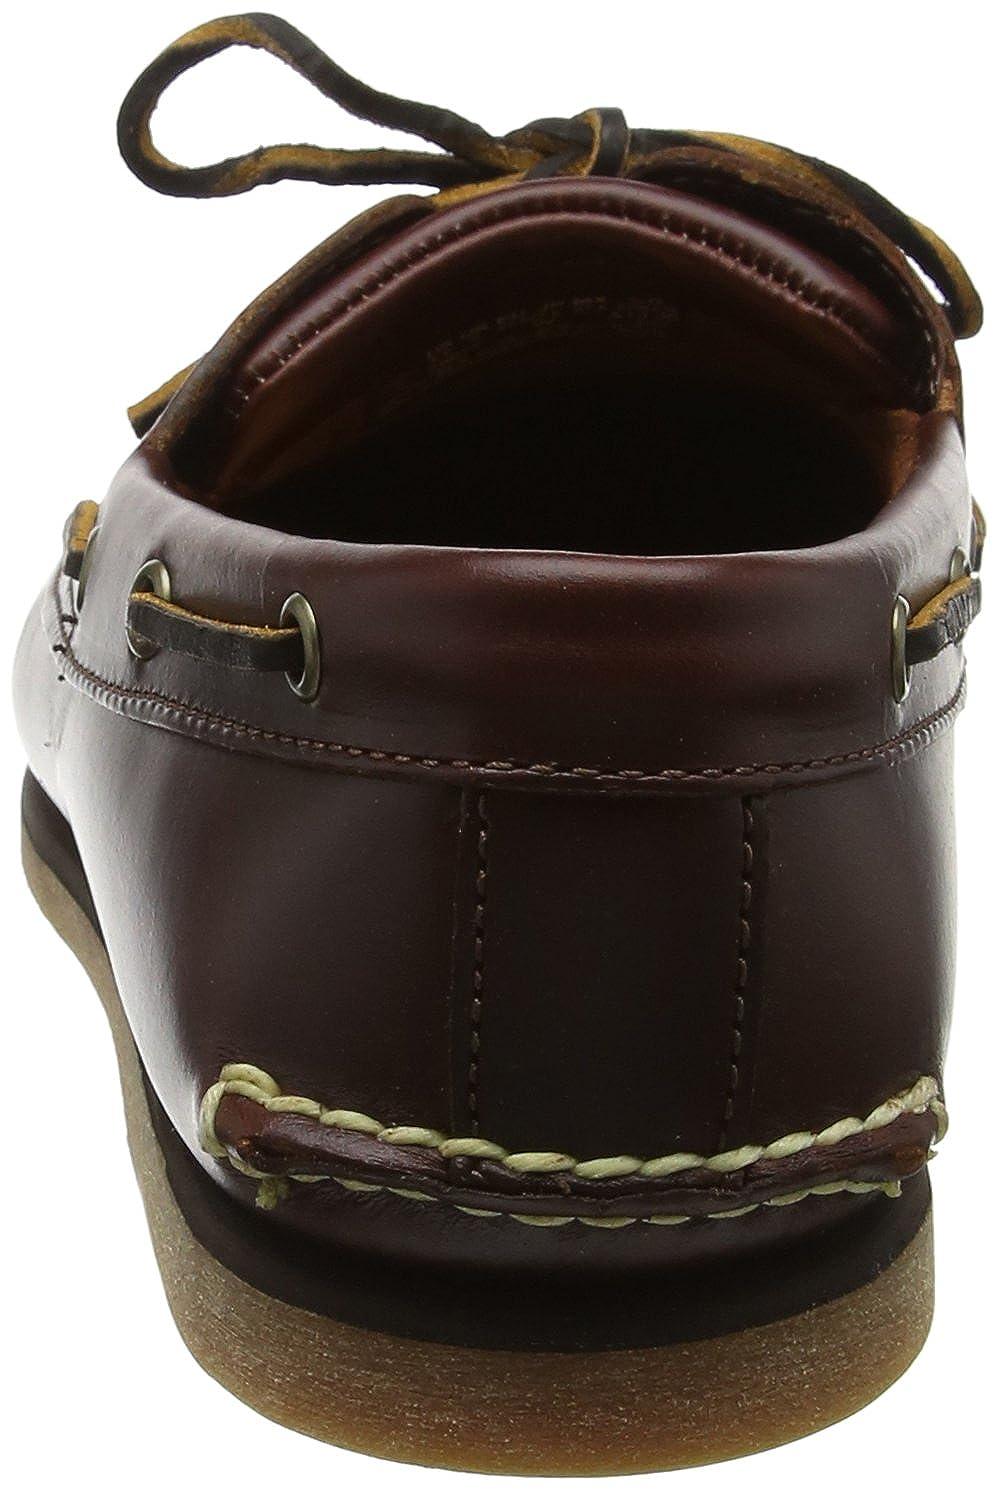 facadbf928adac Timberland Classic 2 Eye, Chaussures Bateau Homme: Amazon.fr: Chaussures et  Sacs